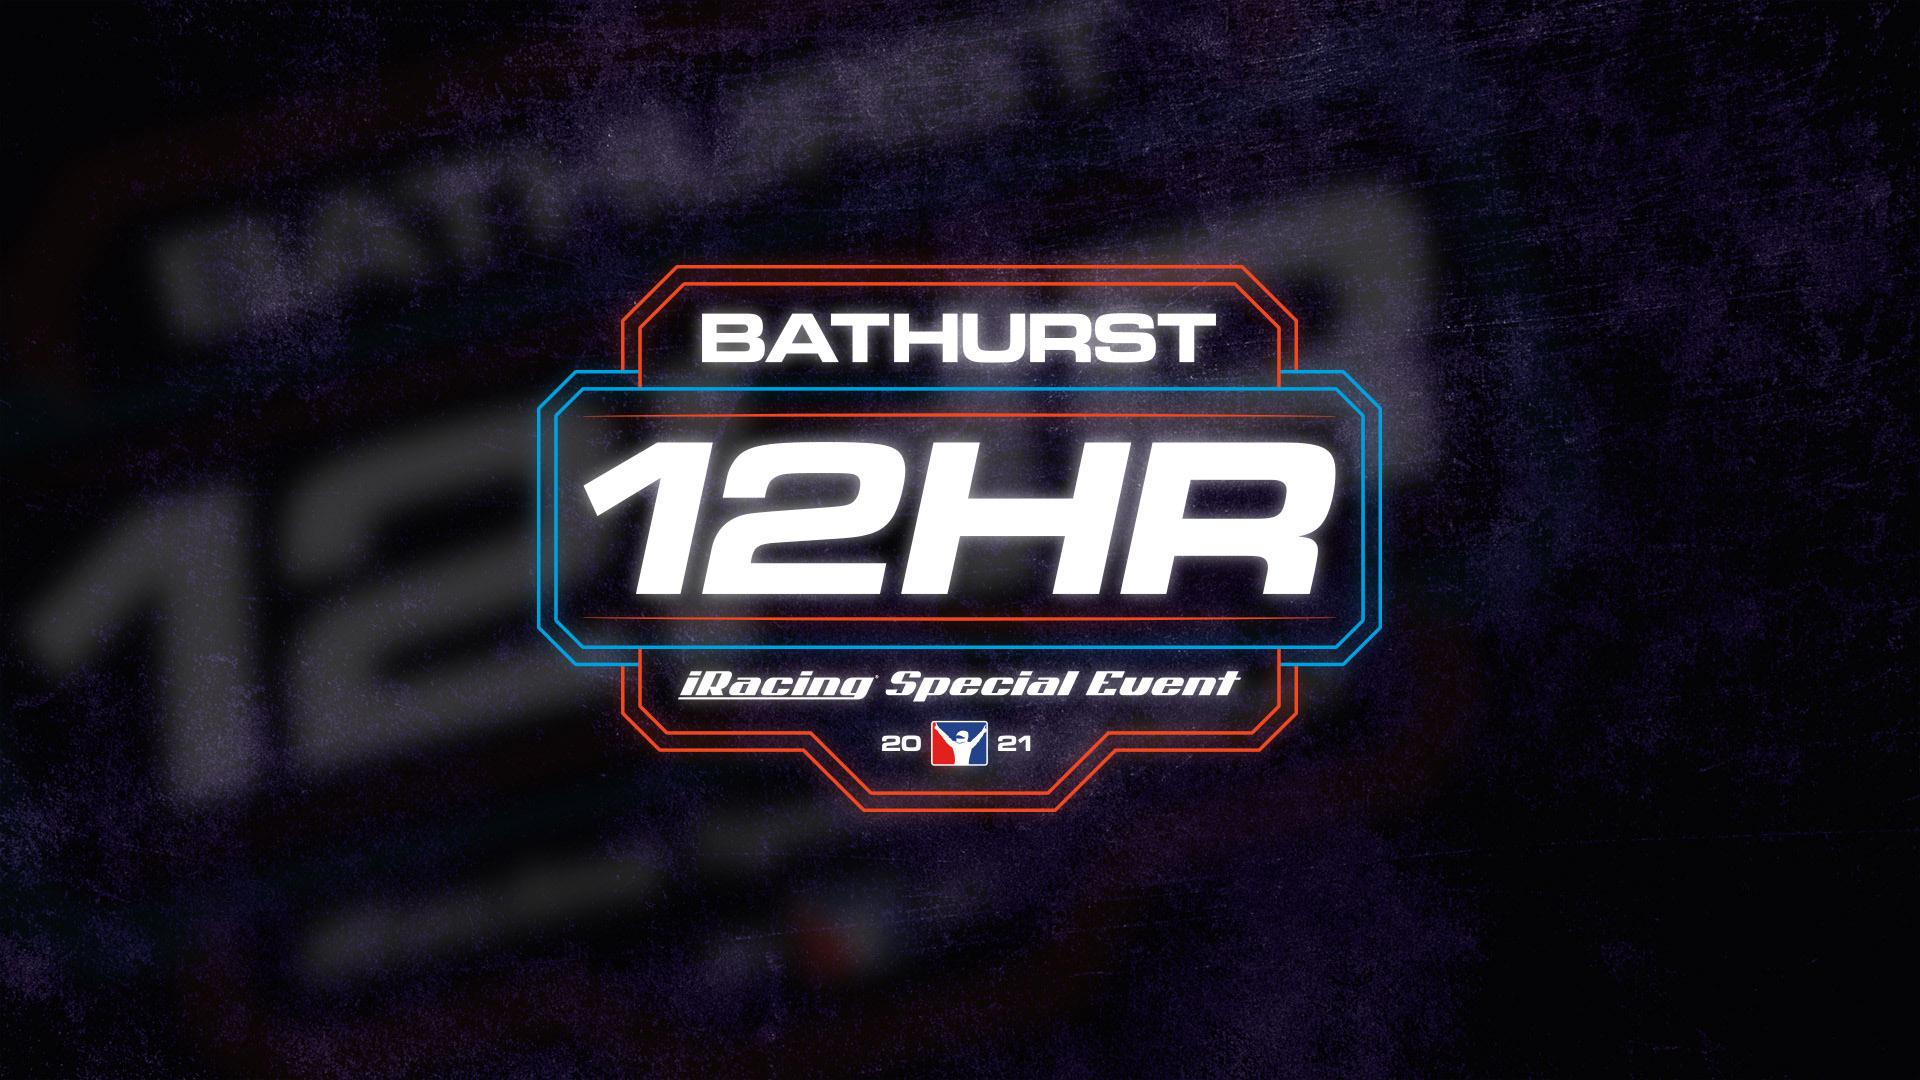 iRSE-Bathurst-12HR-feature.jpg